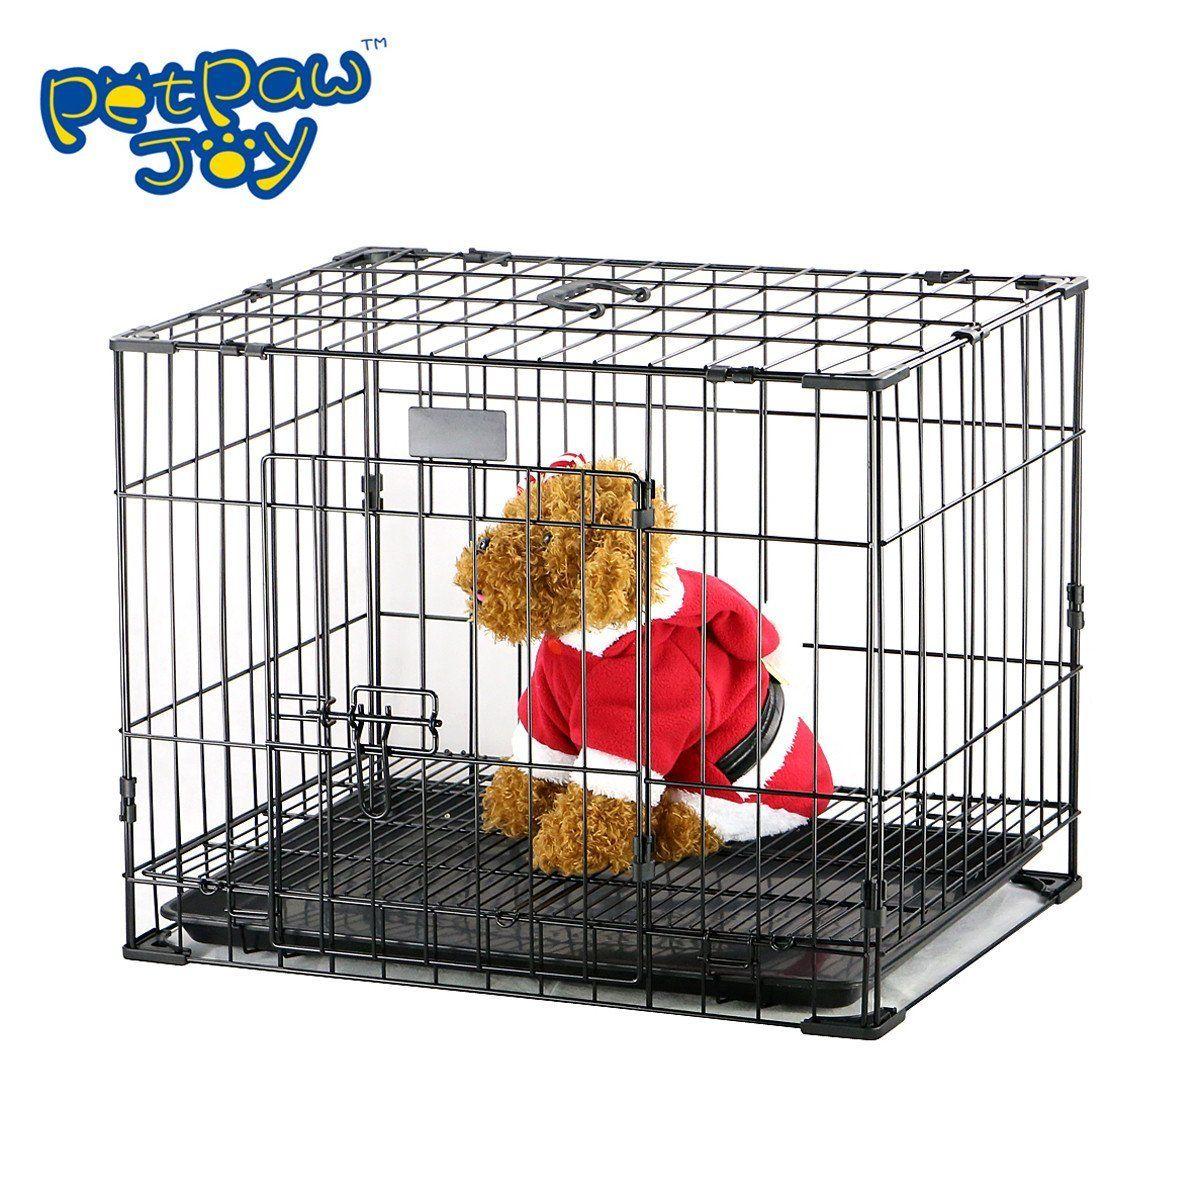 Petpawjoy Nop Rated Single Door Folding Metal Dog Crate With Easy